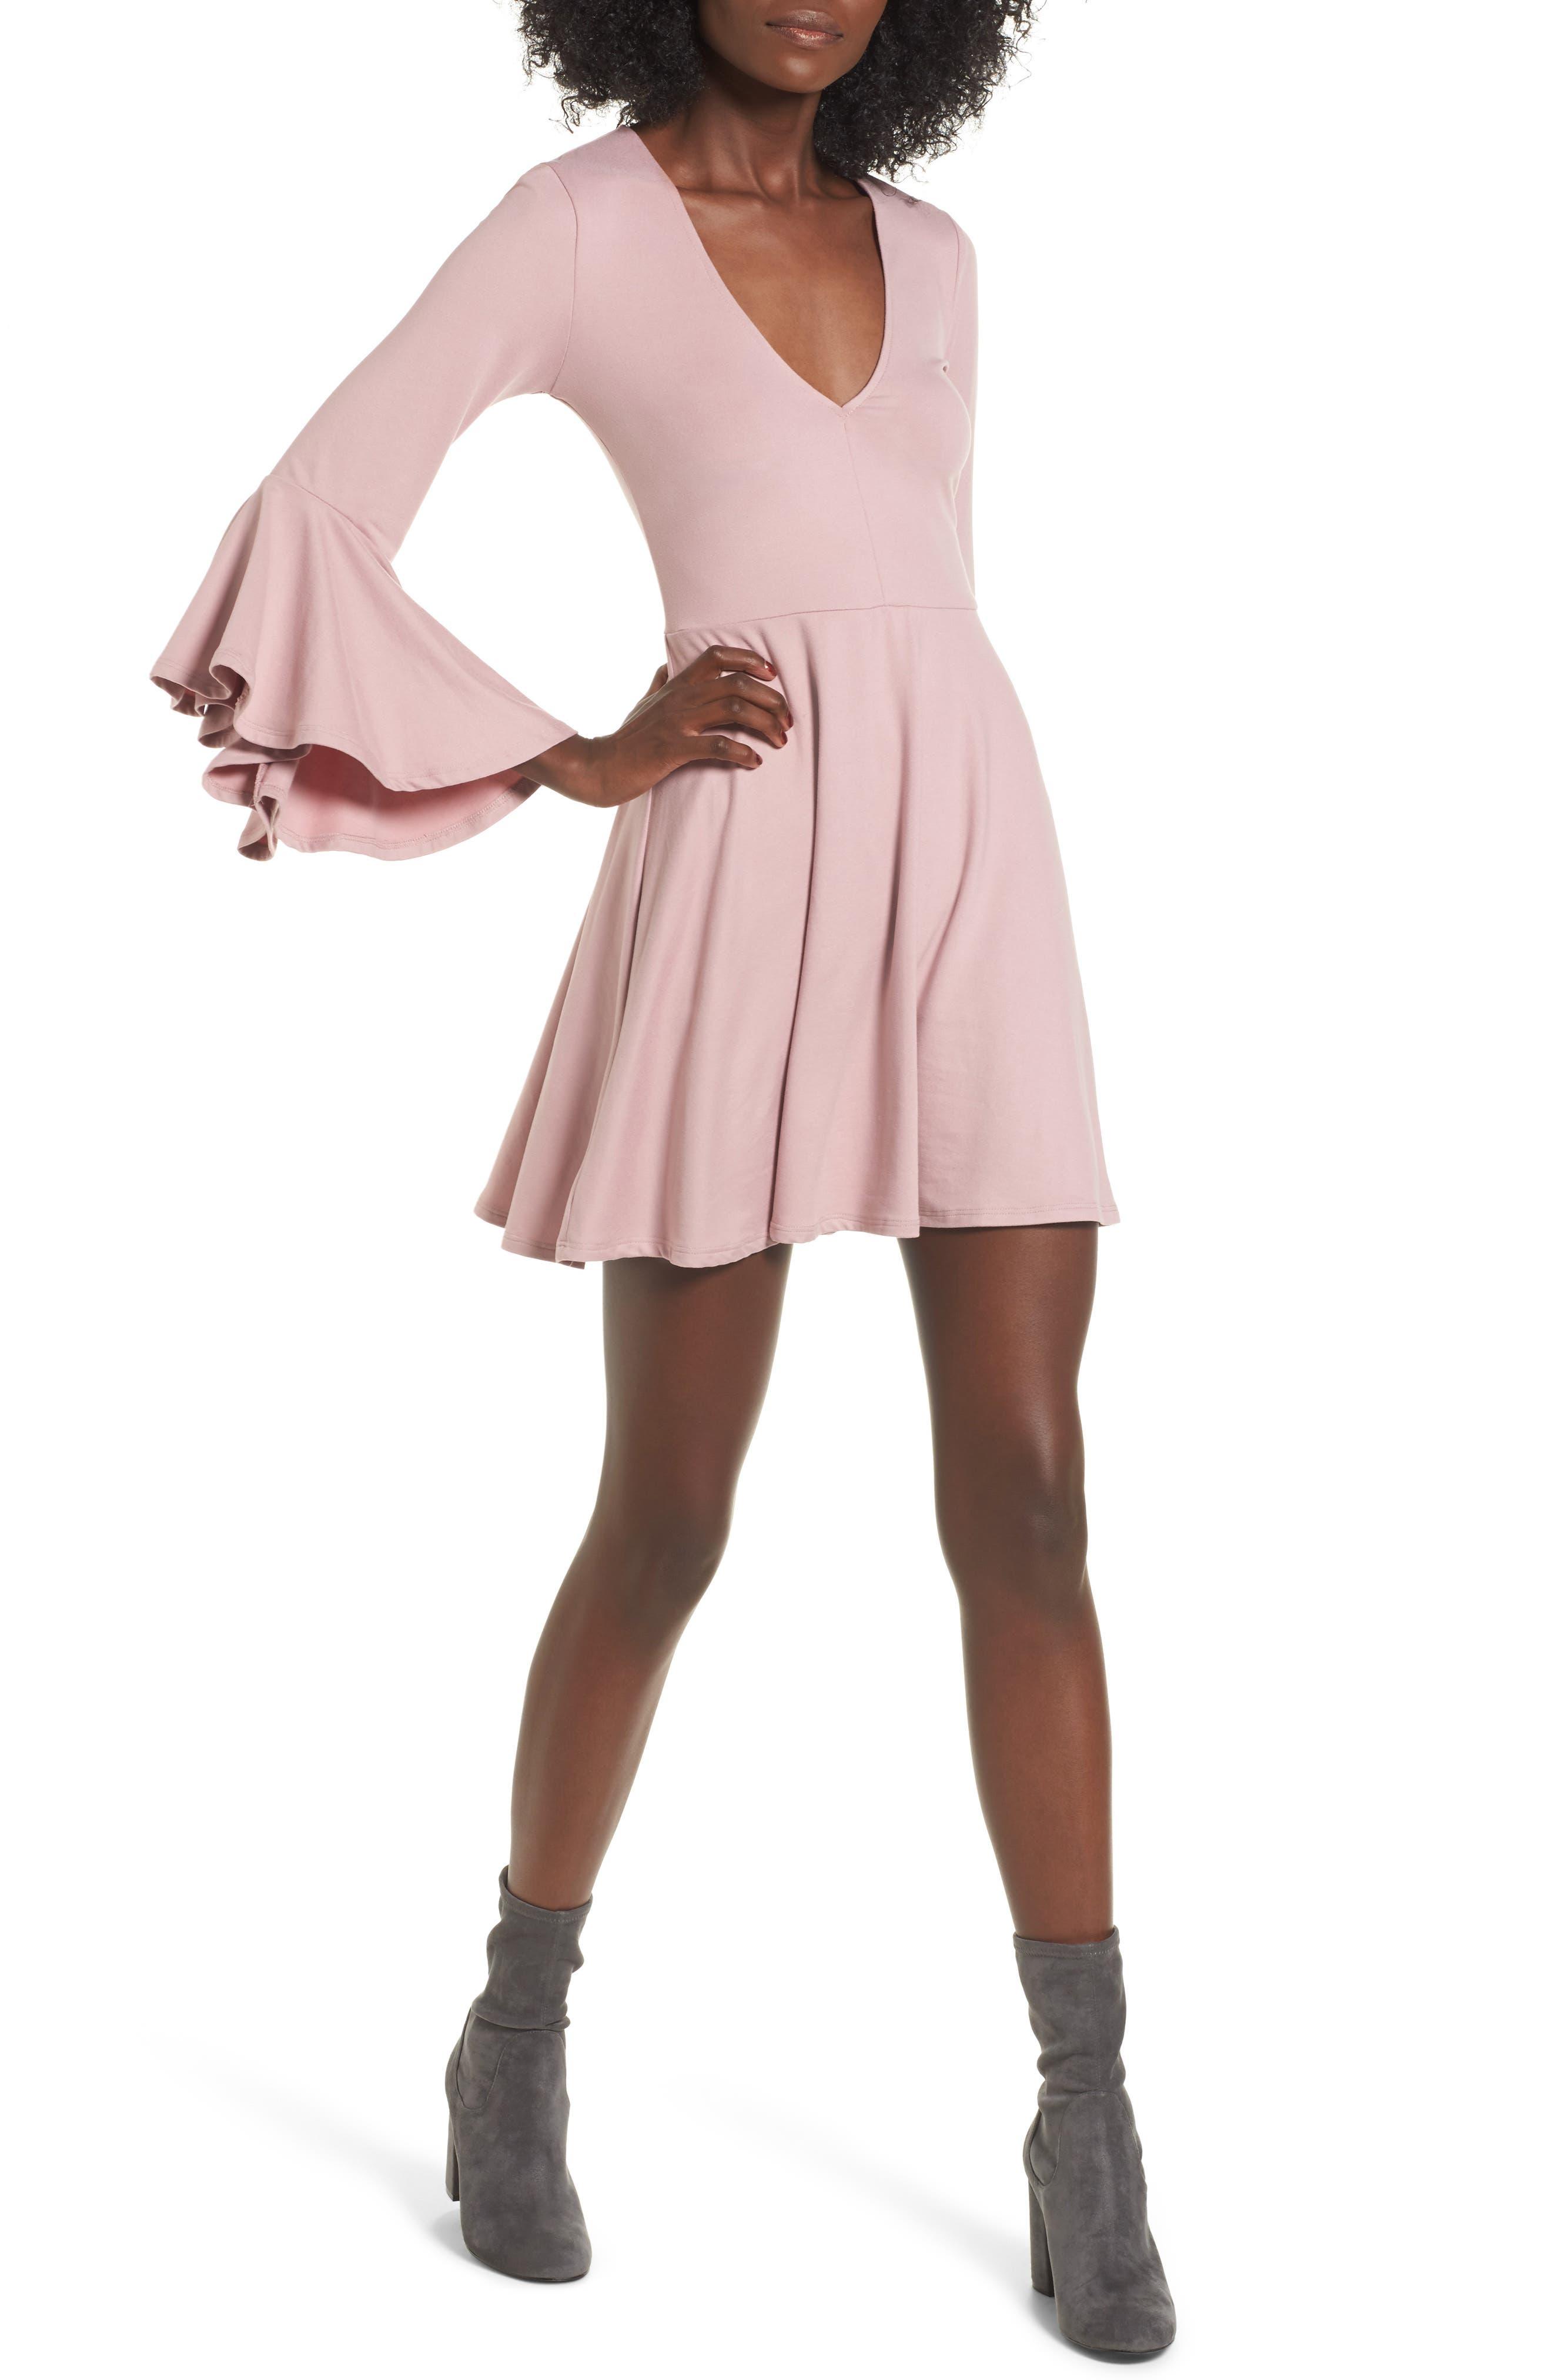 Main Image - Socialite Bell Sleeve Knit Dress